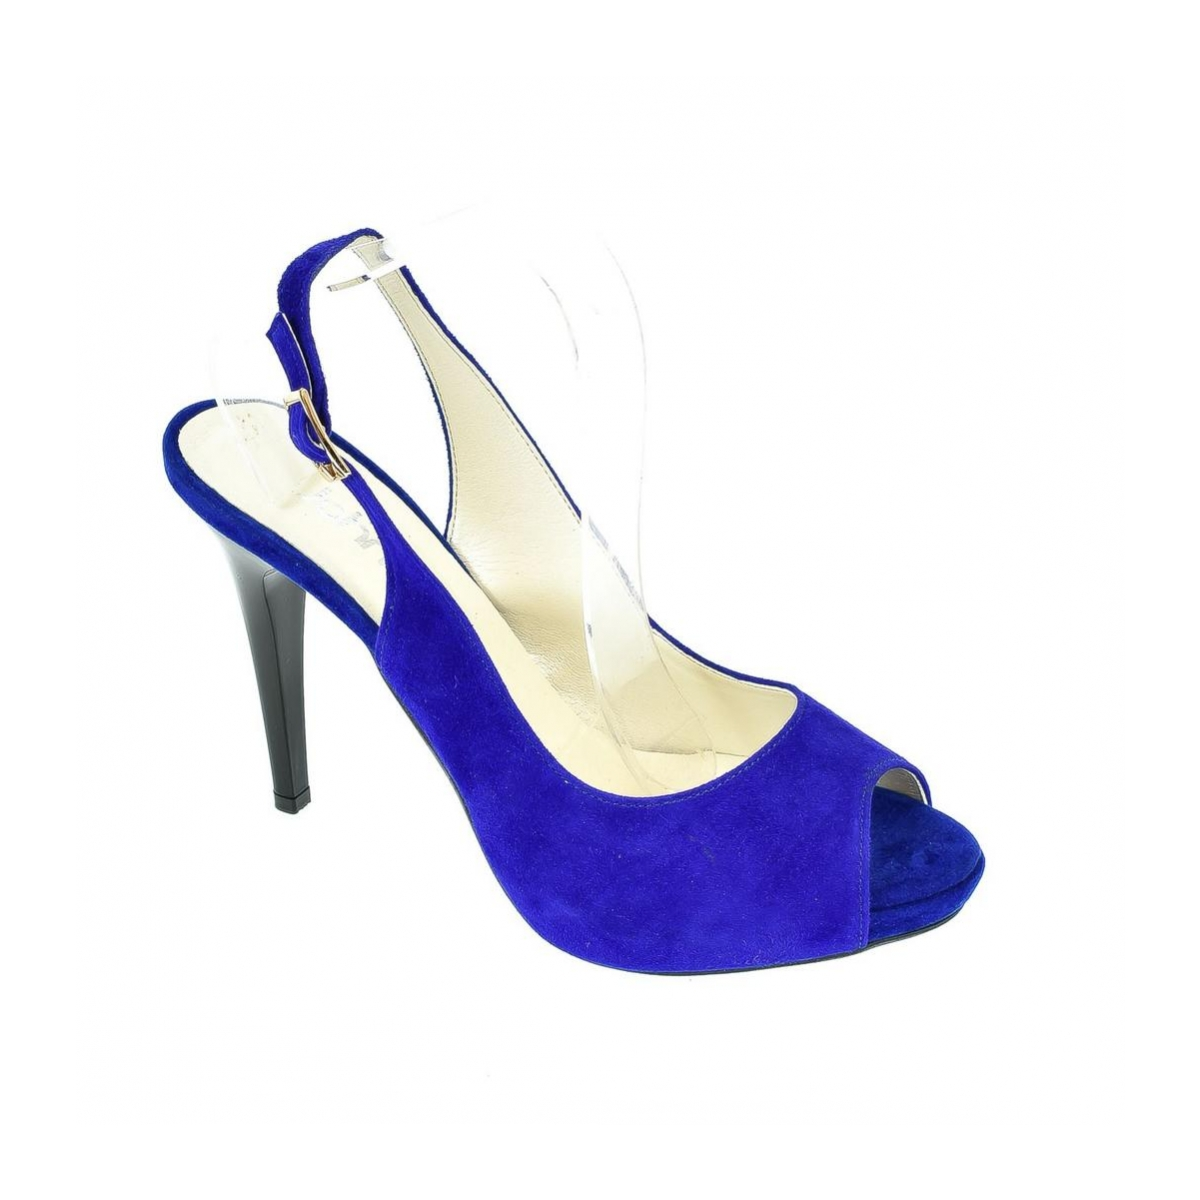 509c4c437d7a Dámske kožené modré sandále SINNI - 3